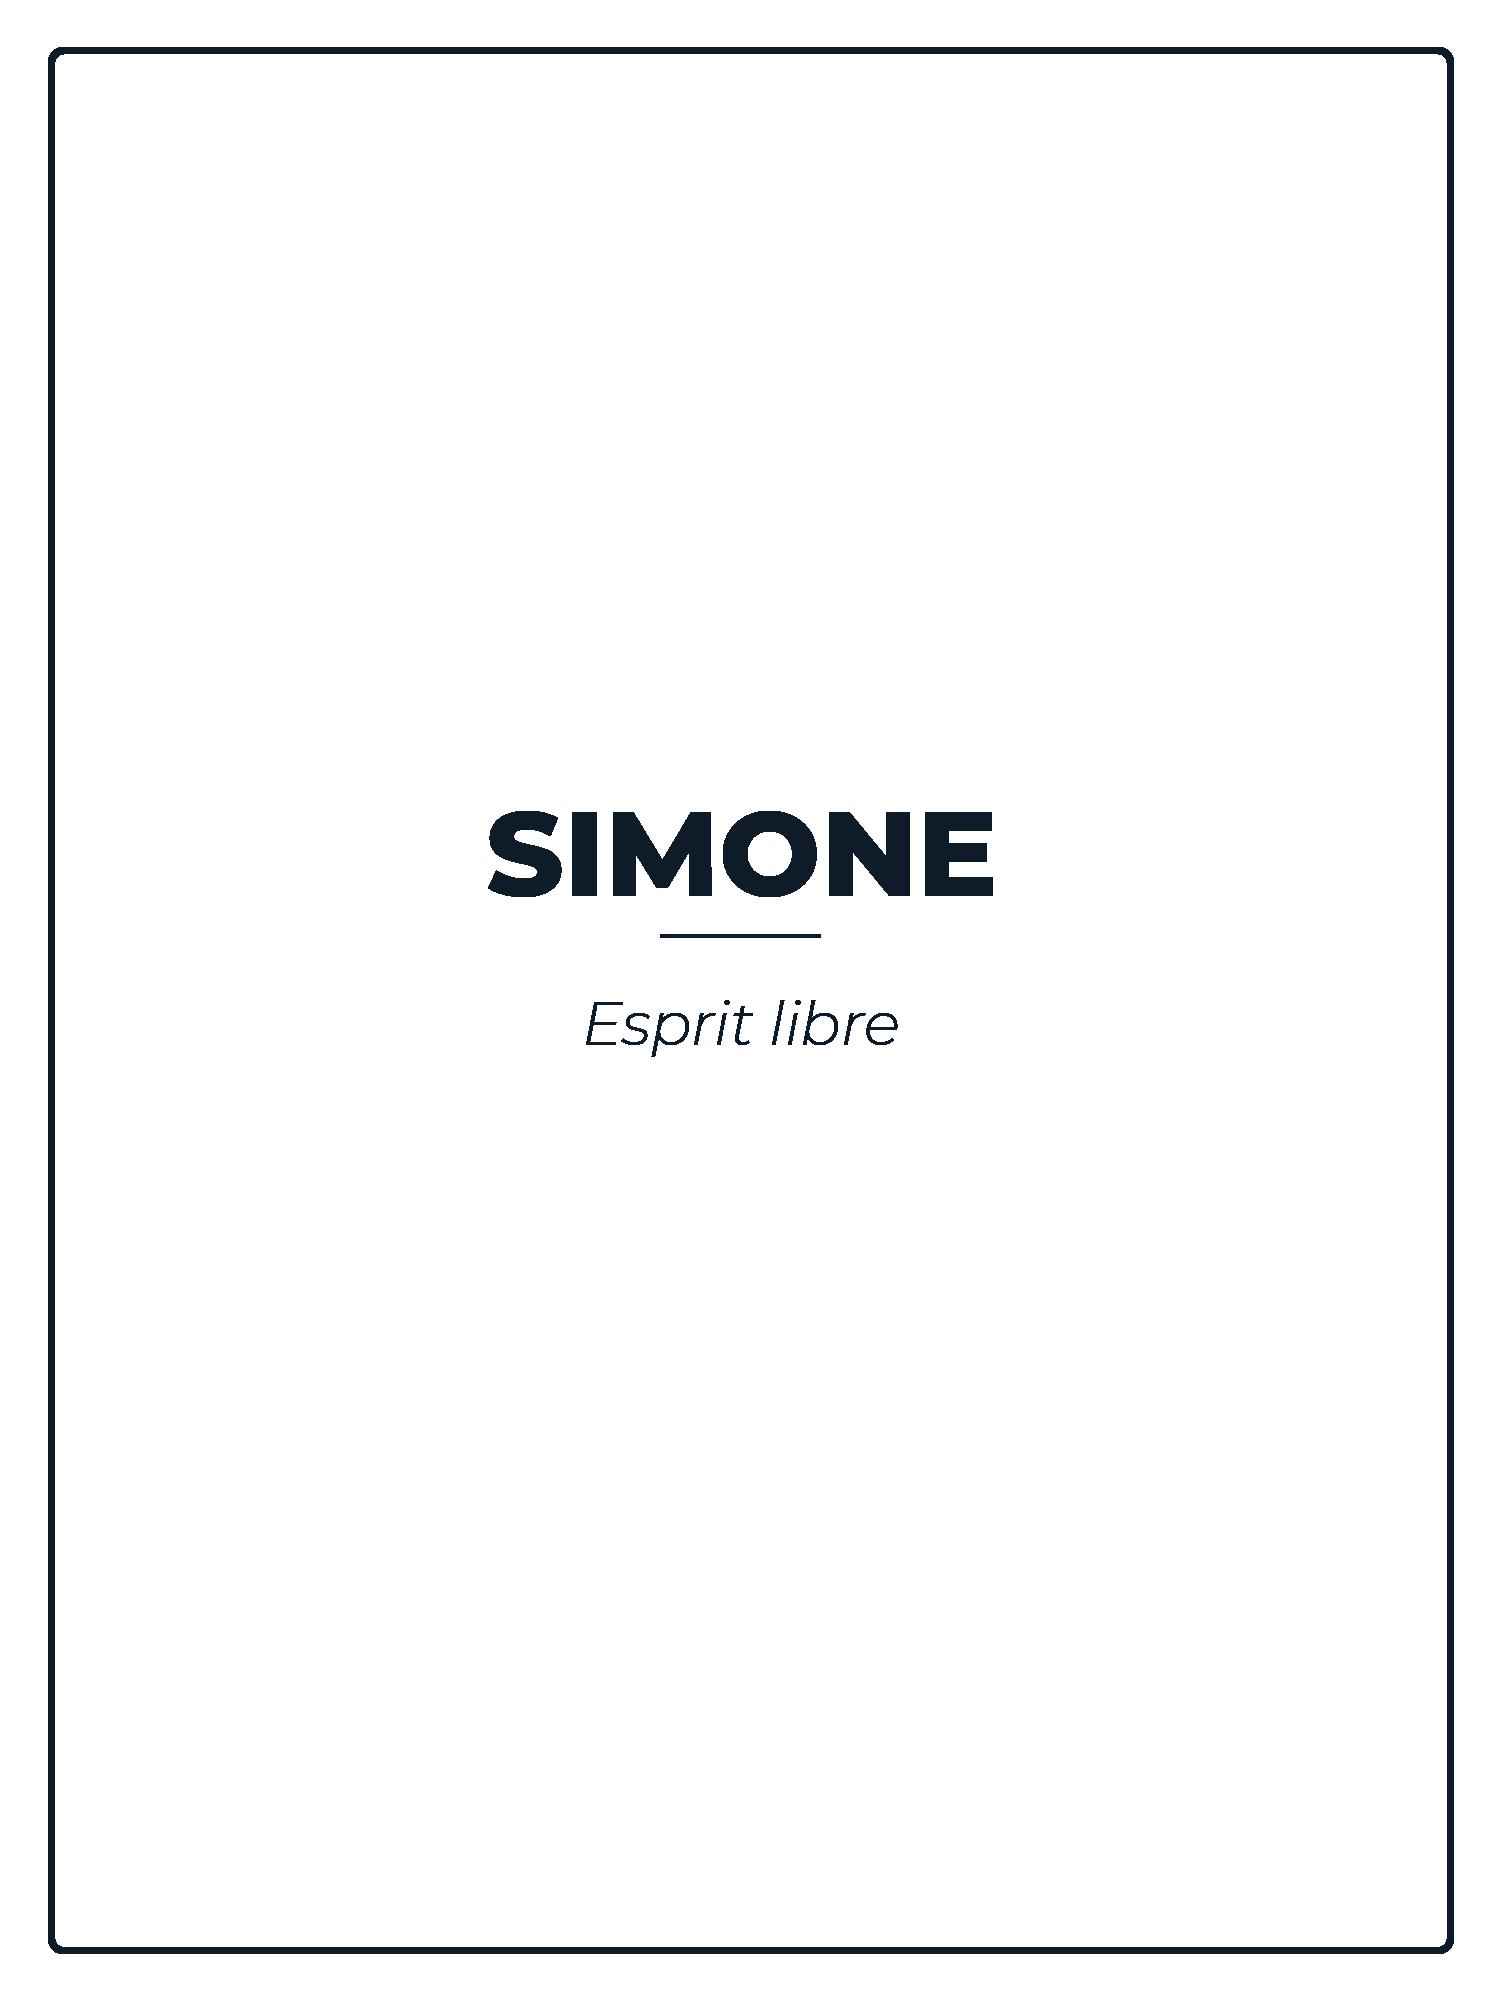 SIMONE-PARFUM